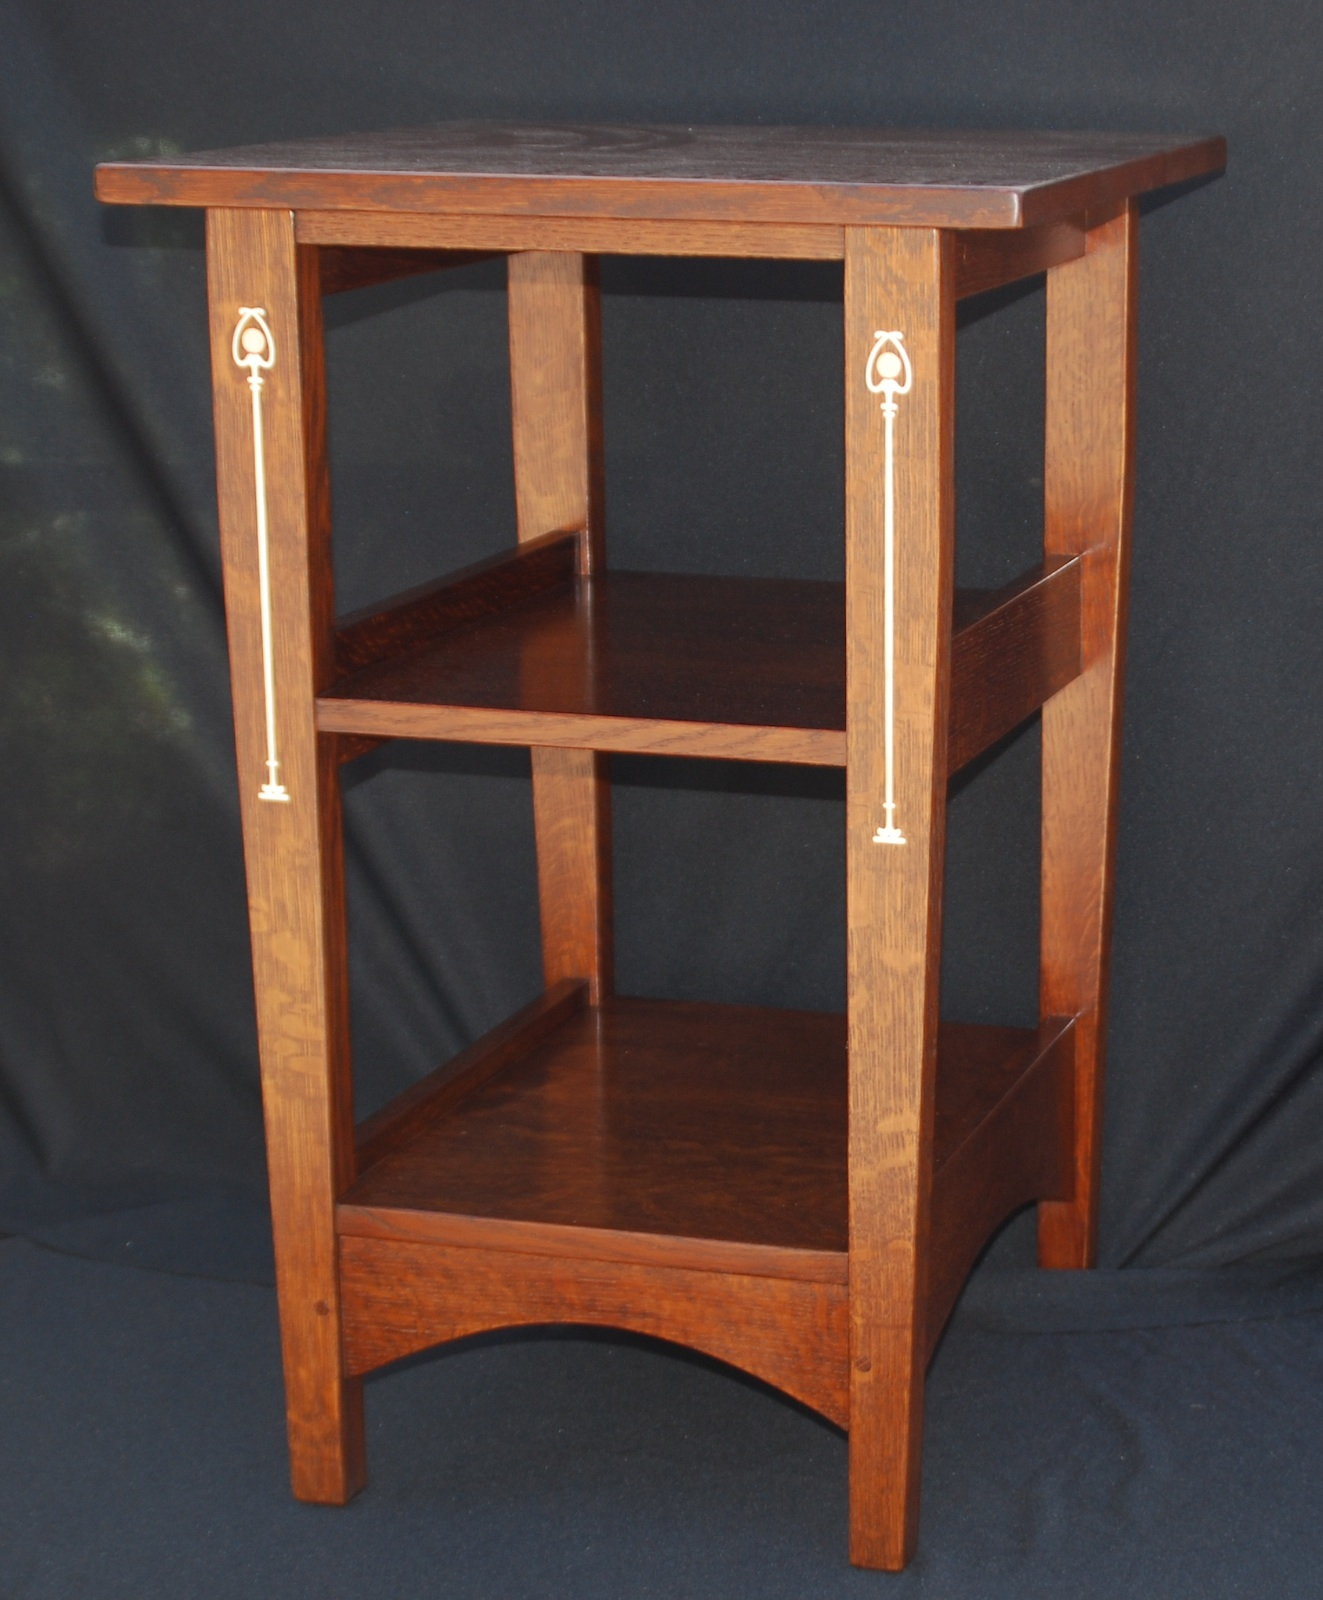 stickley sterling sofa table leather company frisco voorhees craftsman mission oak furniture gustav